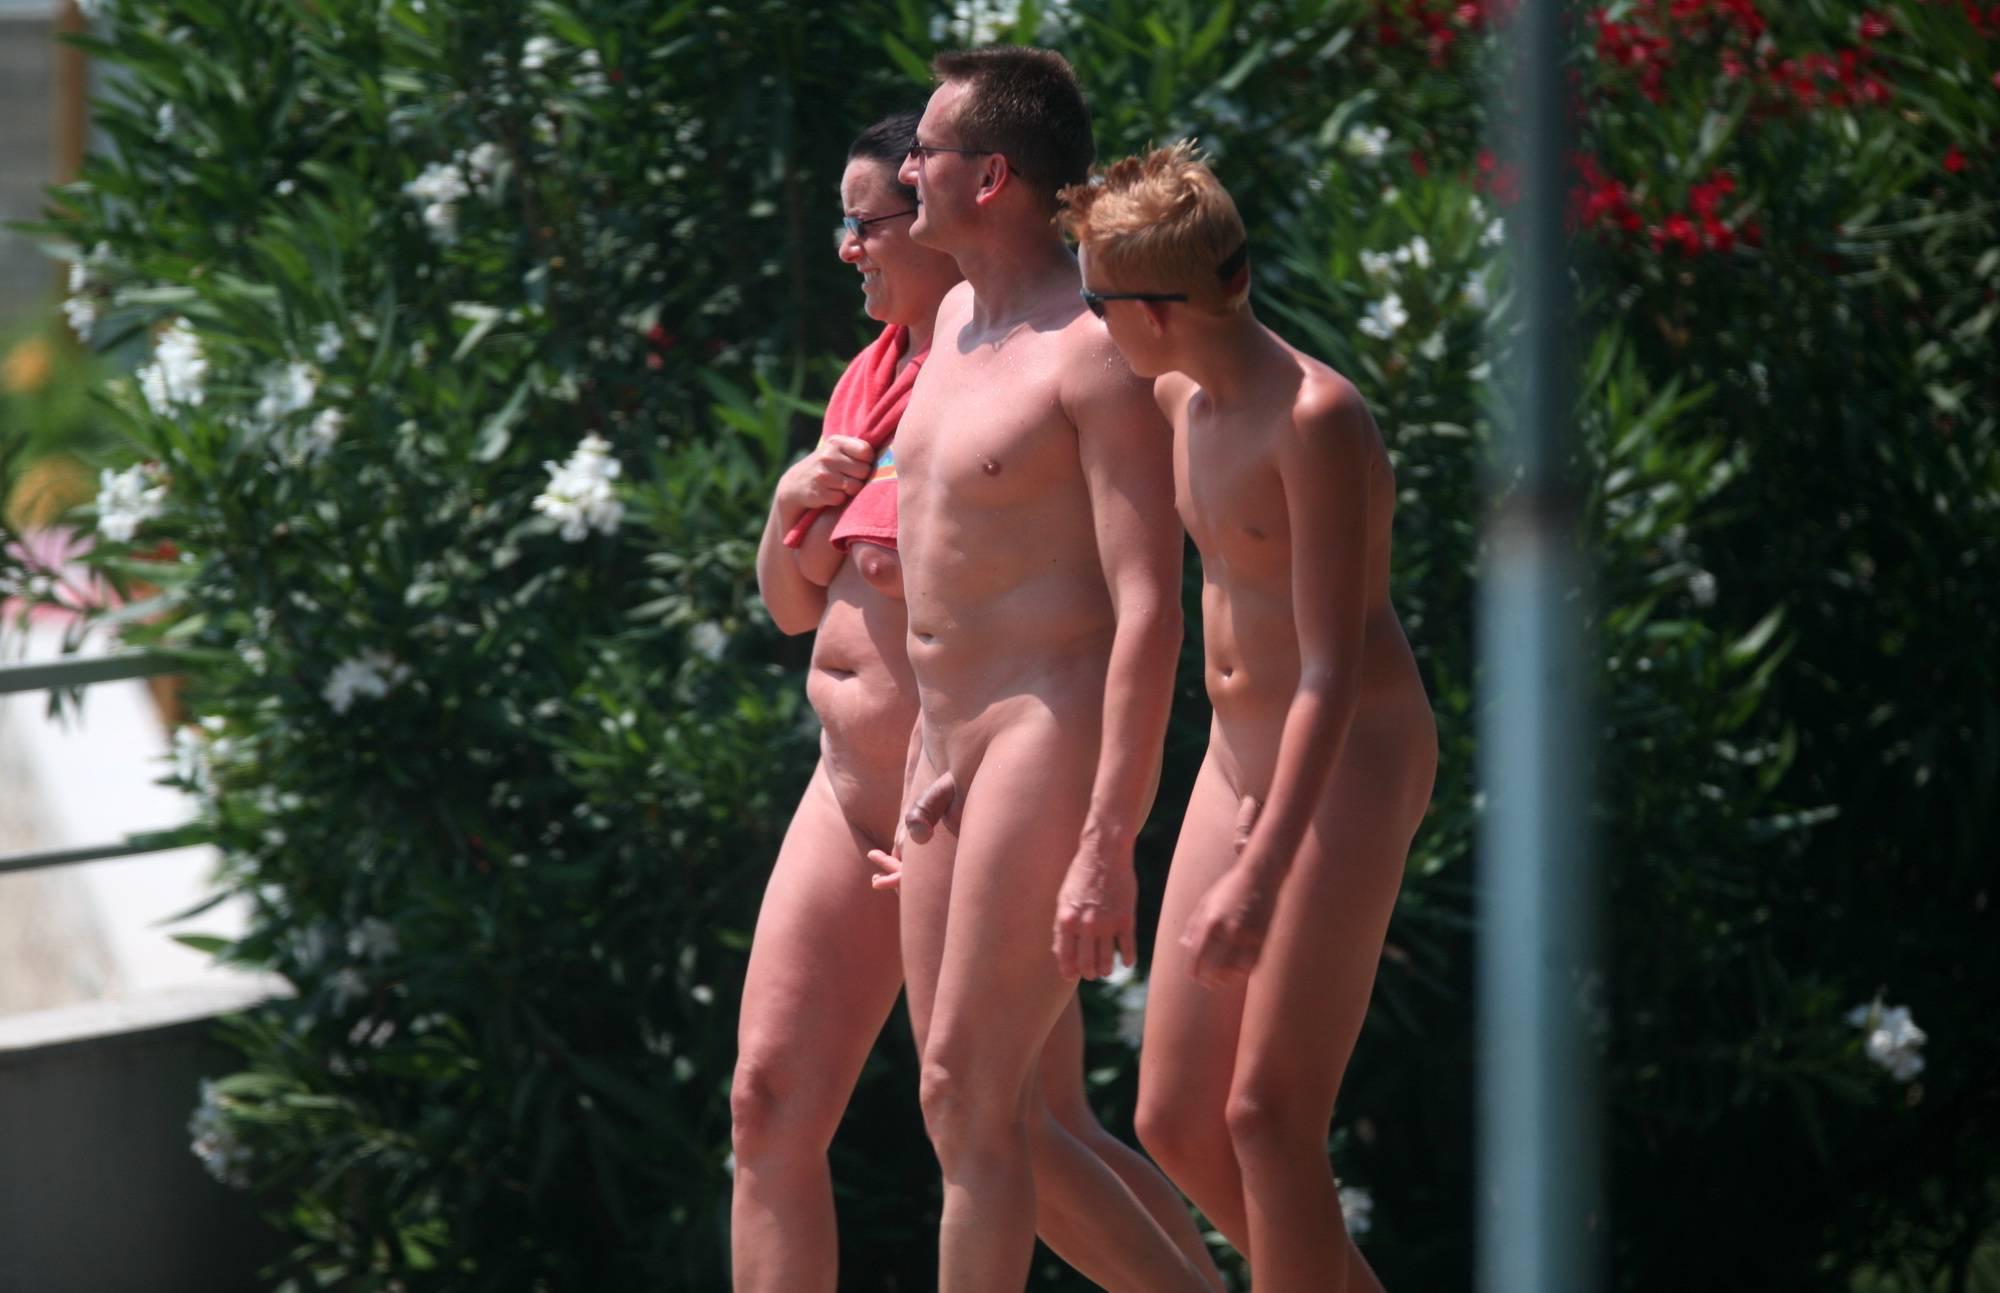 Nudist Sunny Day Friends - 1